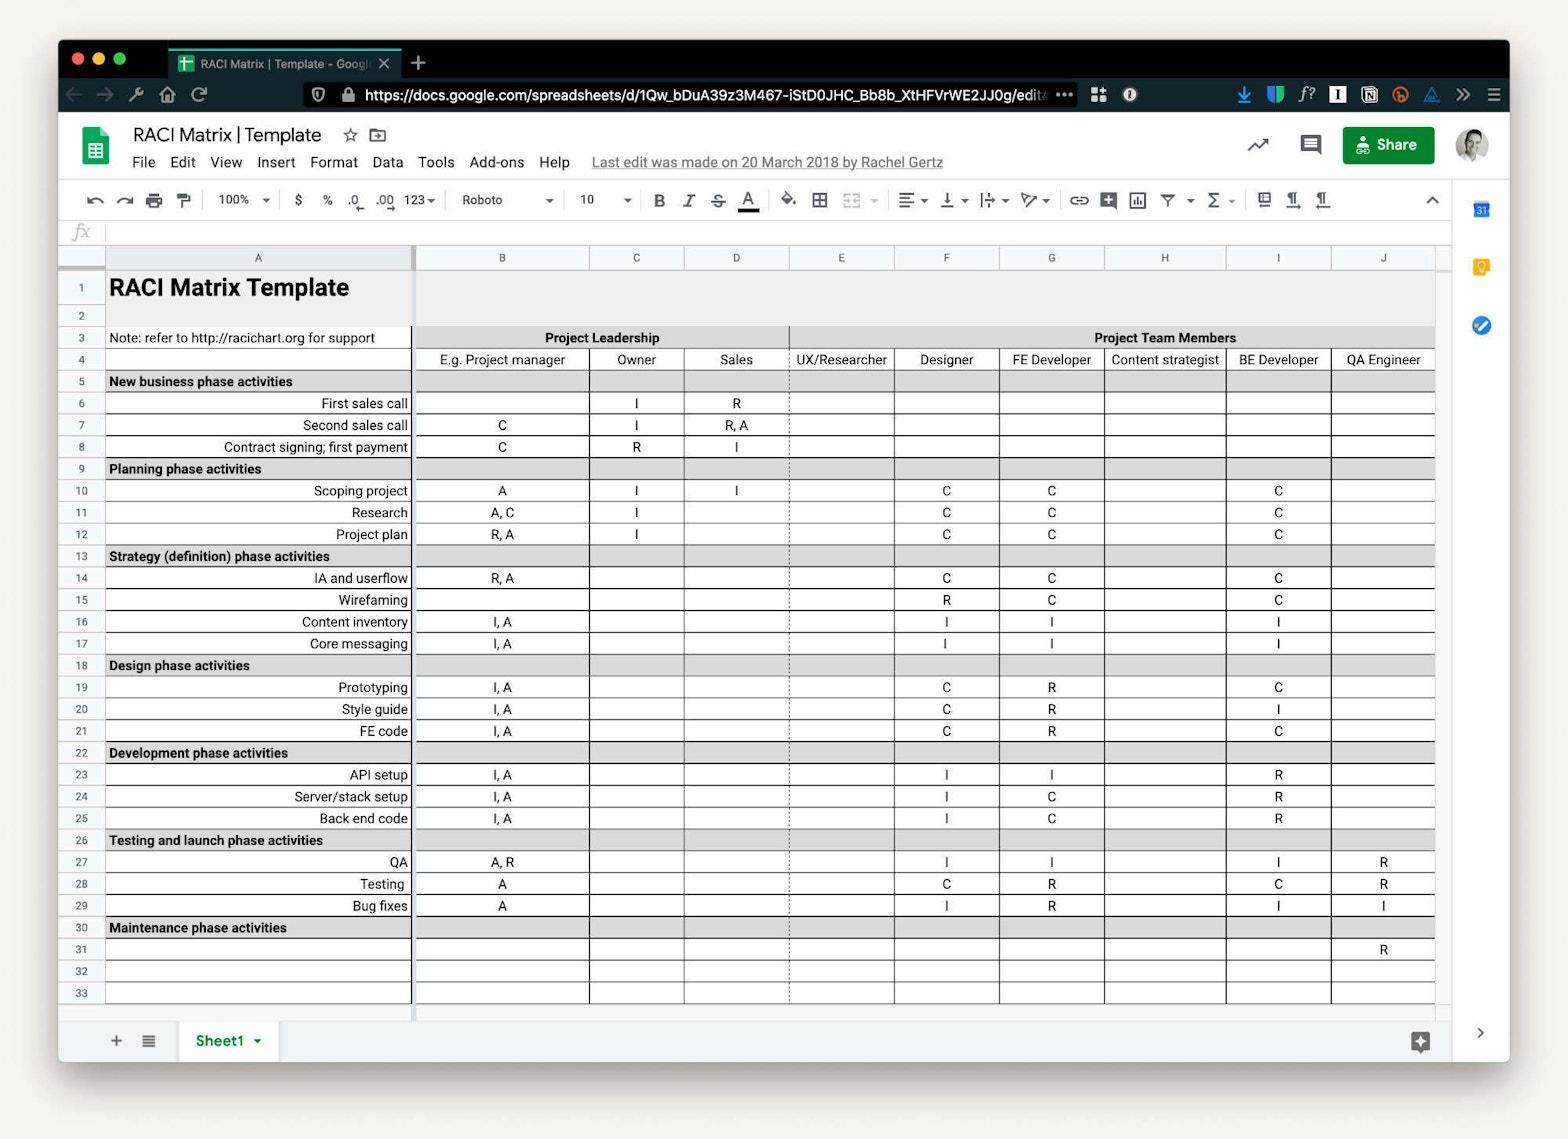 Screenshot of an old-style RACI spreadsheet